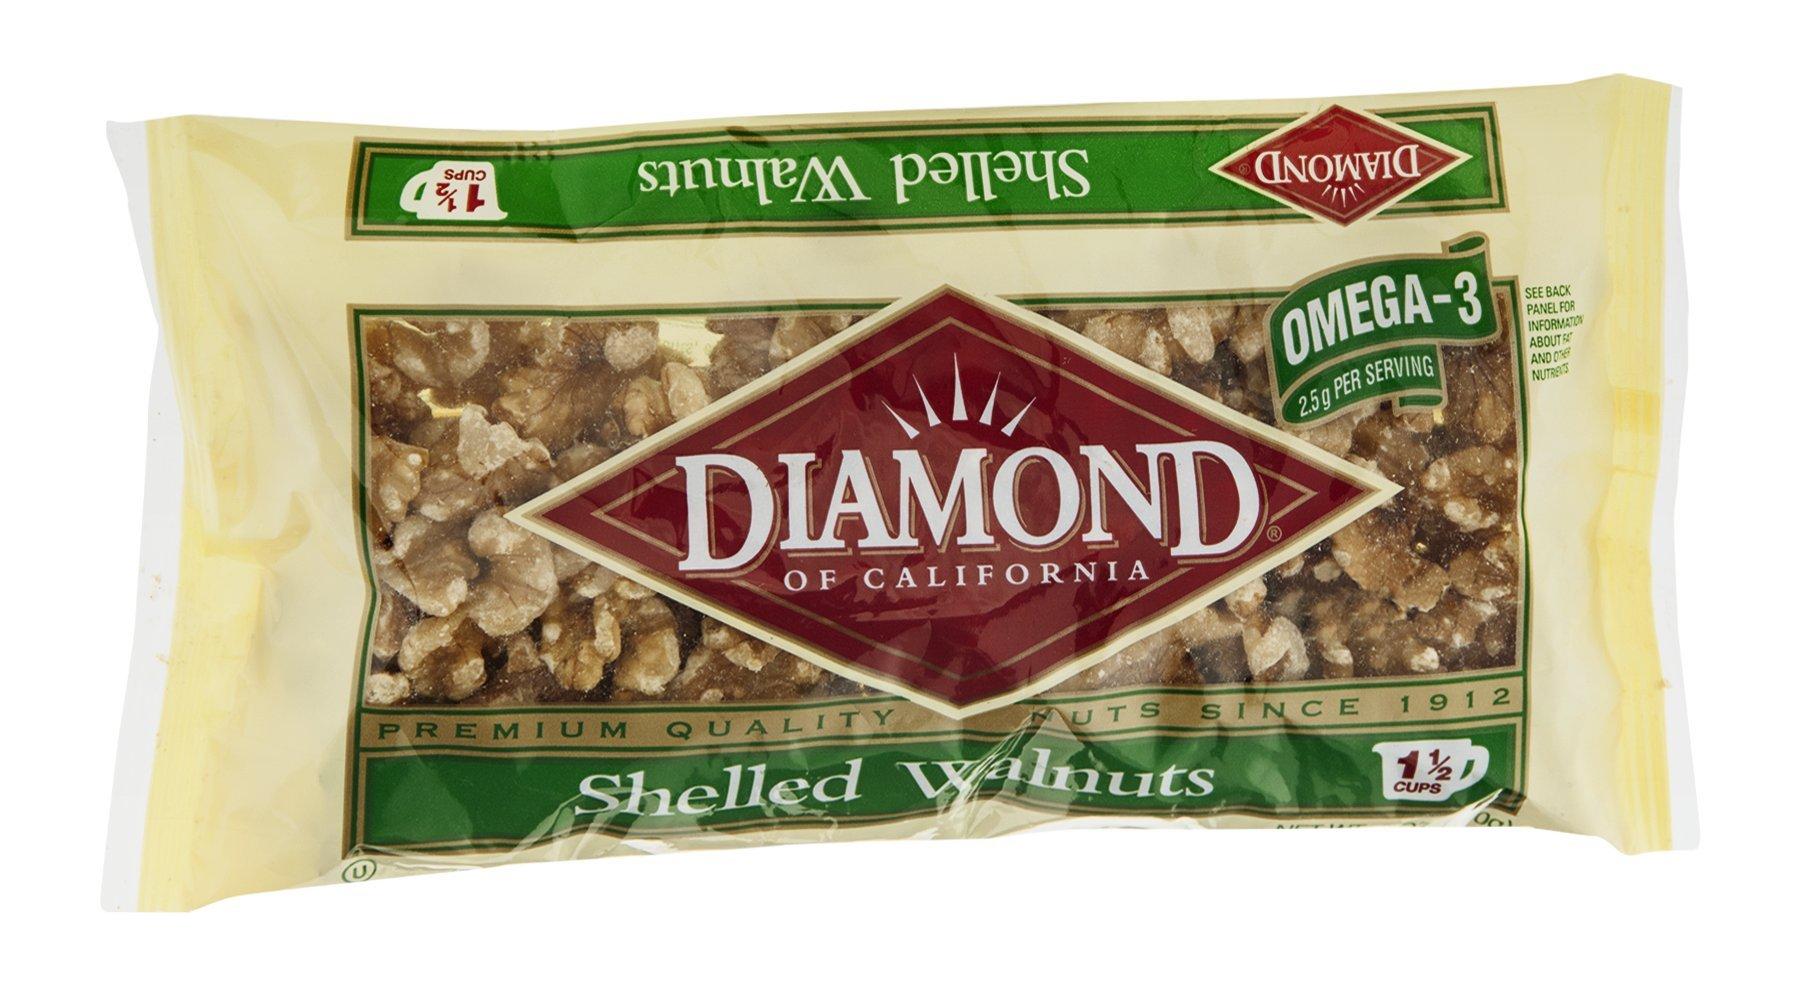 Diamond Walnuts Shelled 6 OZ (Pack of 12)